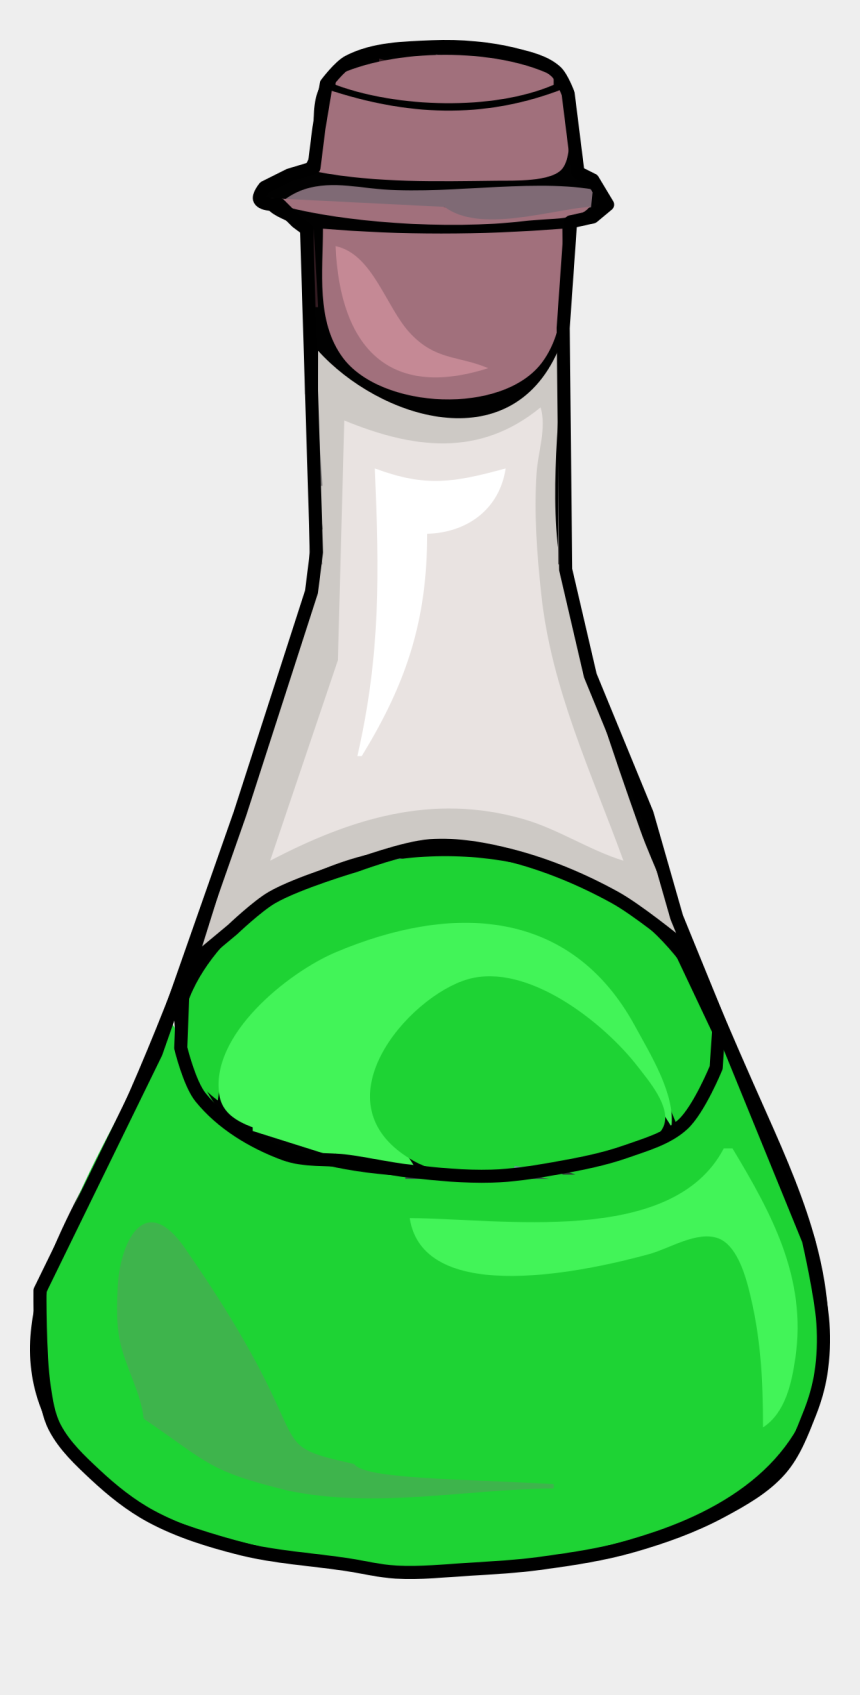 pill bottle clipart, Cartoons - Clipart - Science Bottle Png